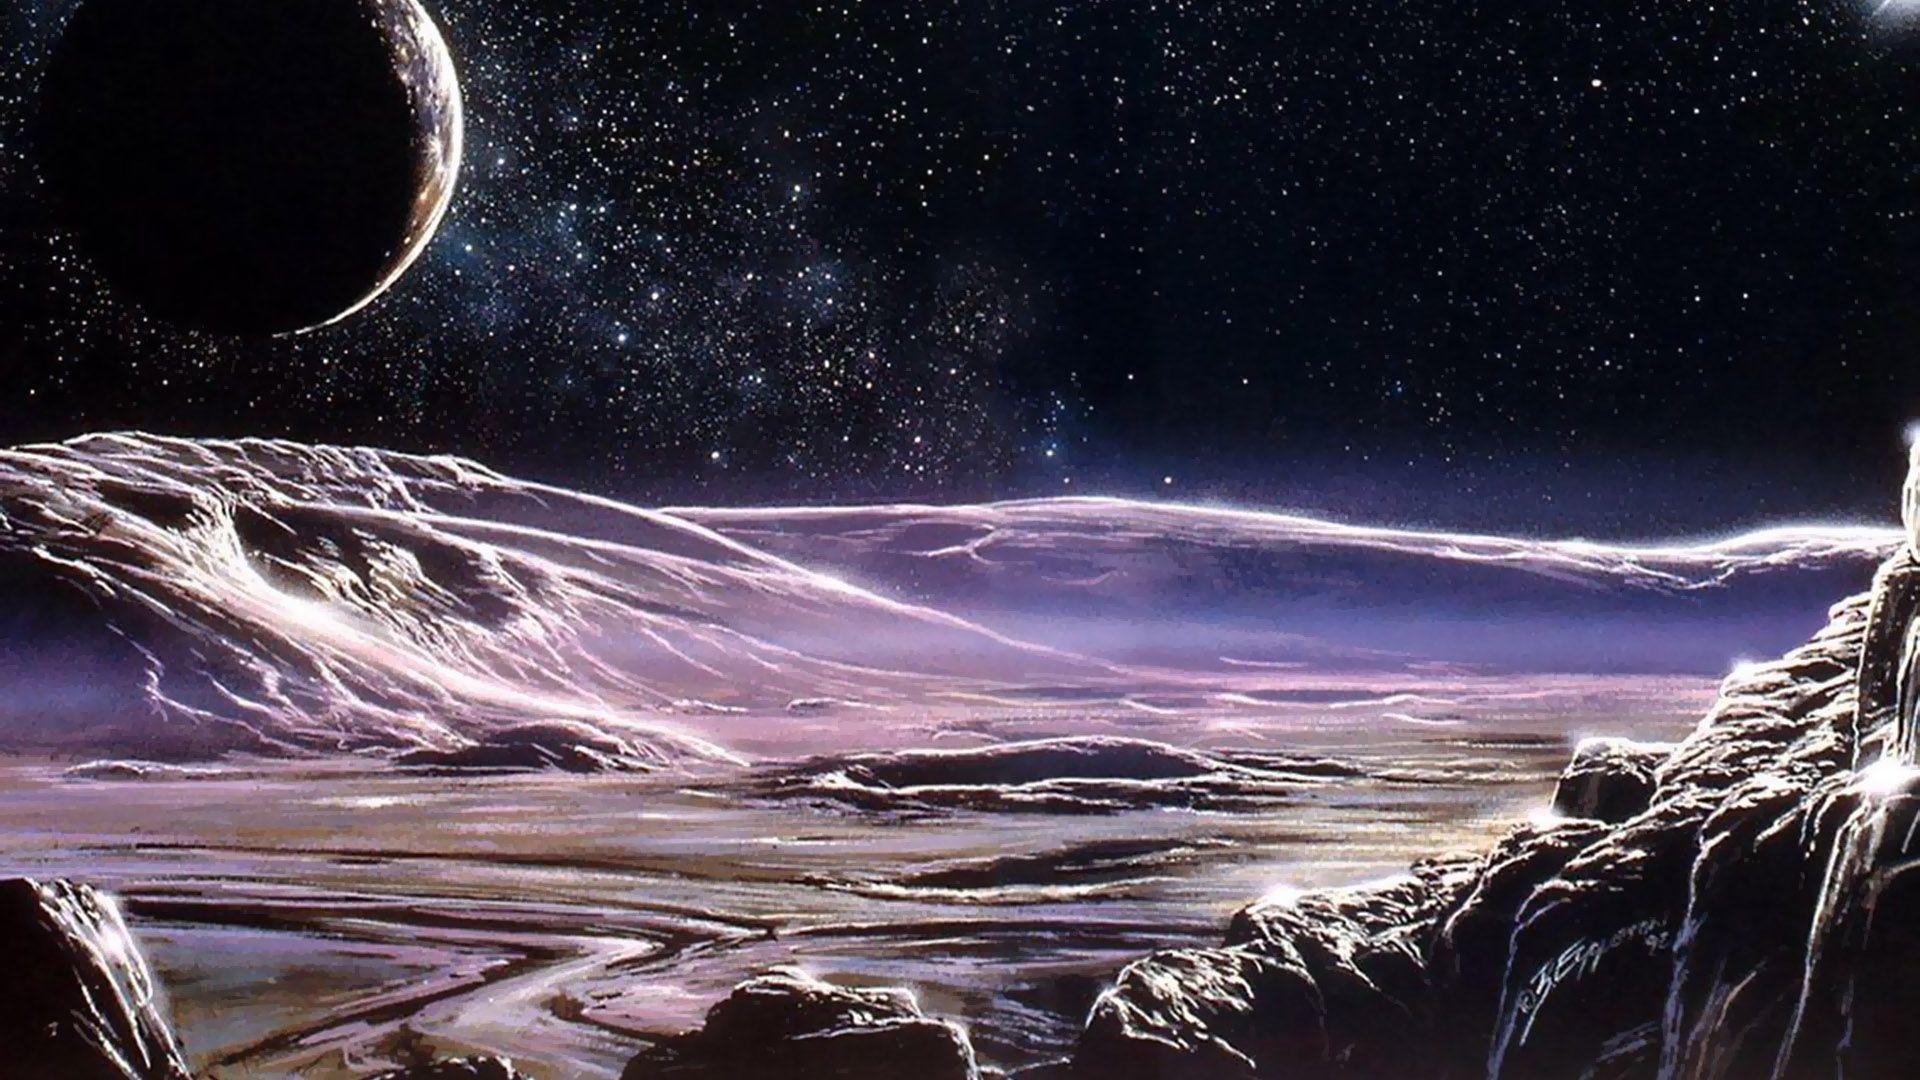 NASA Backgrounds for Desktop